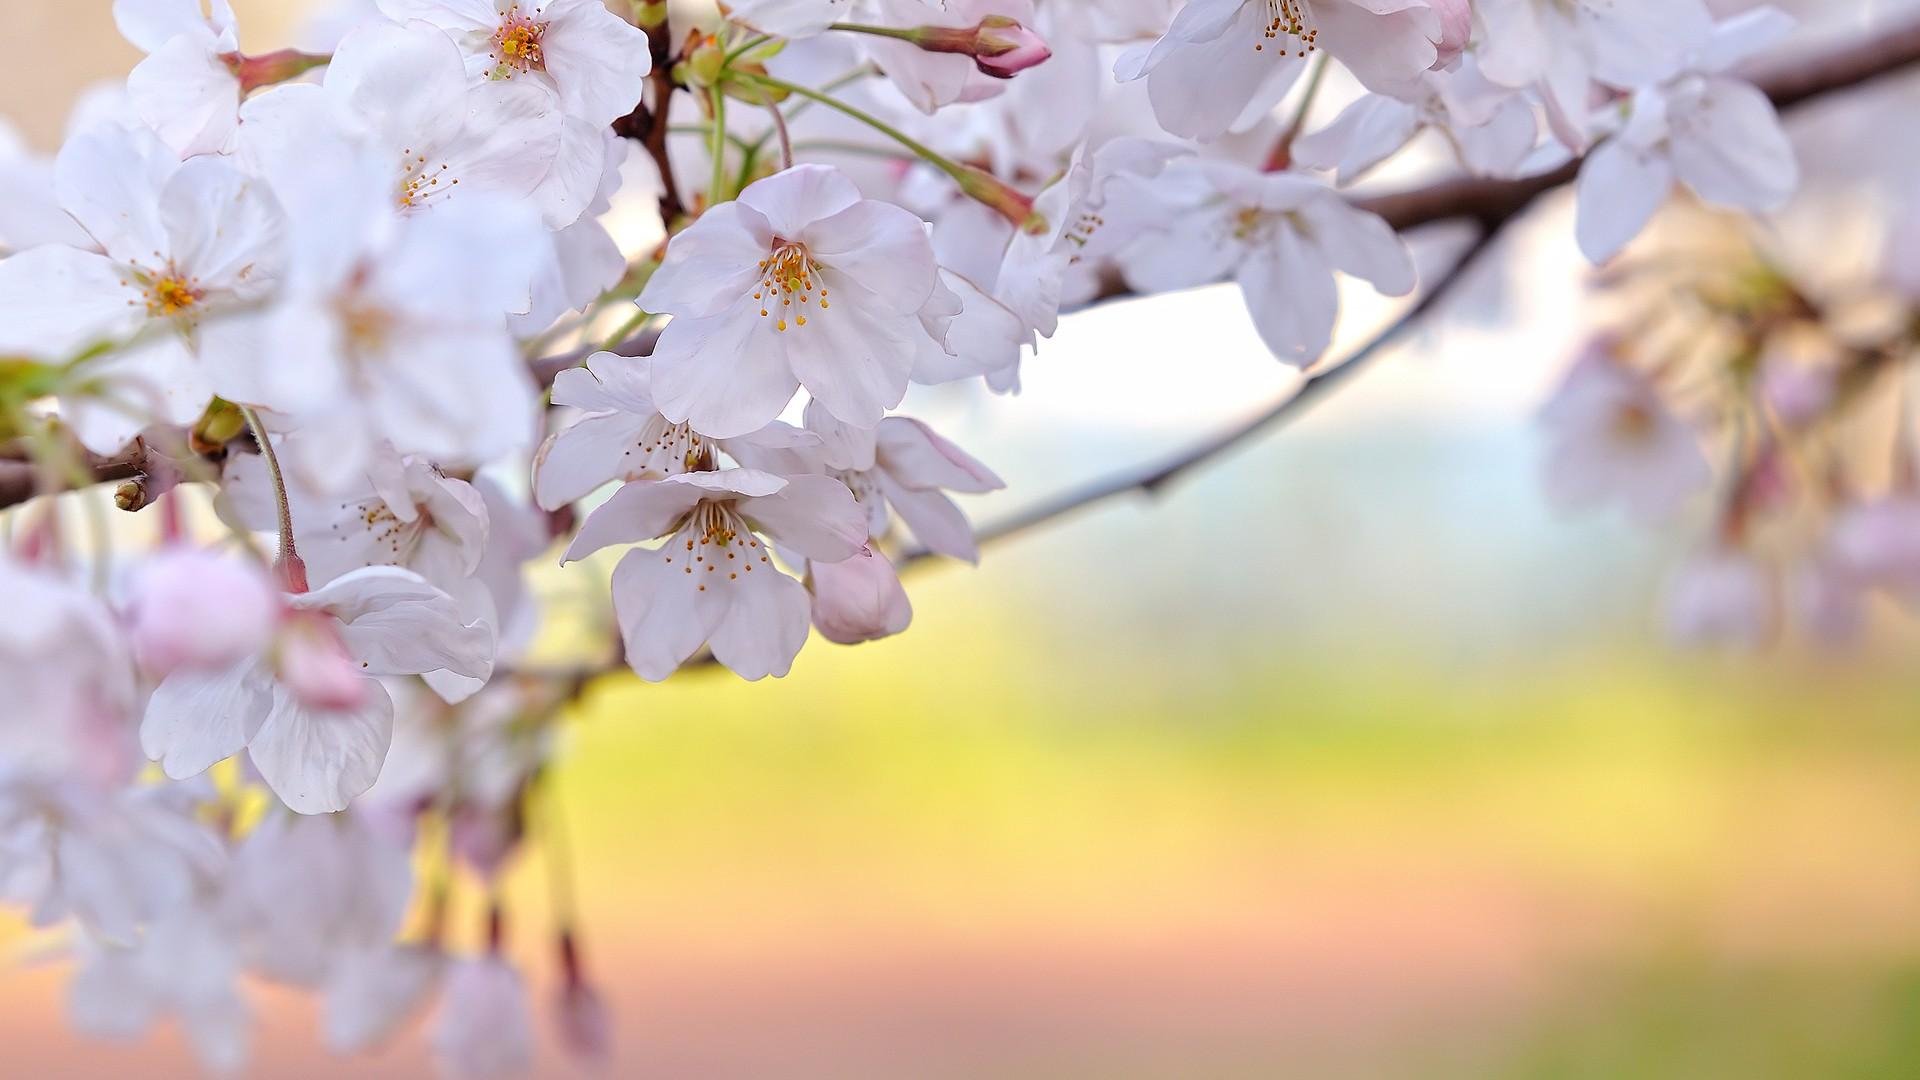 Красивые обои на раб стол весна